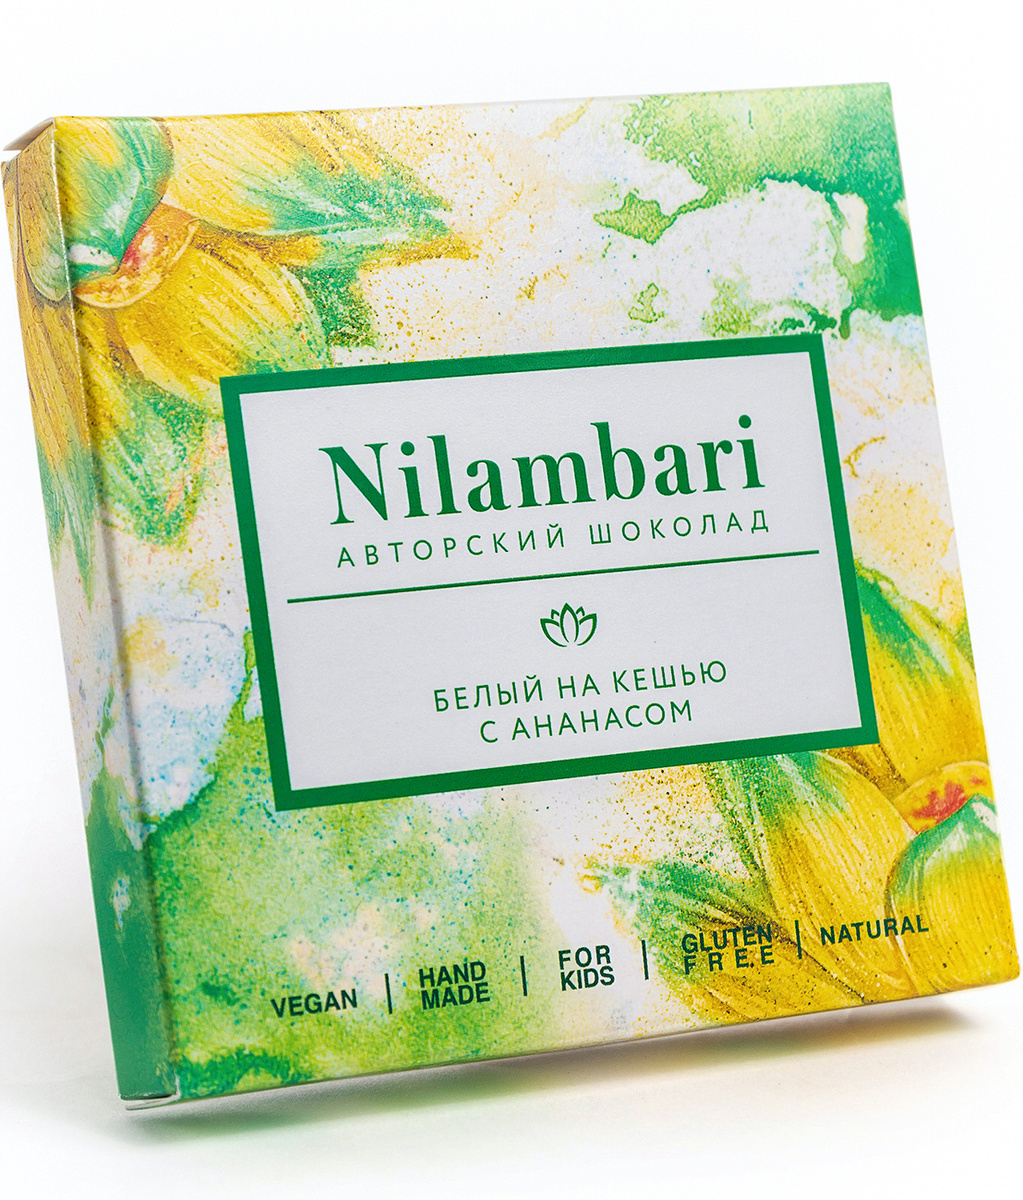 Шоколад Nilambari белый на кешью с ананасом / GreenMania #1